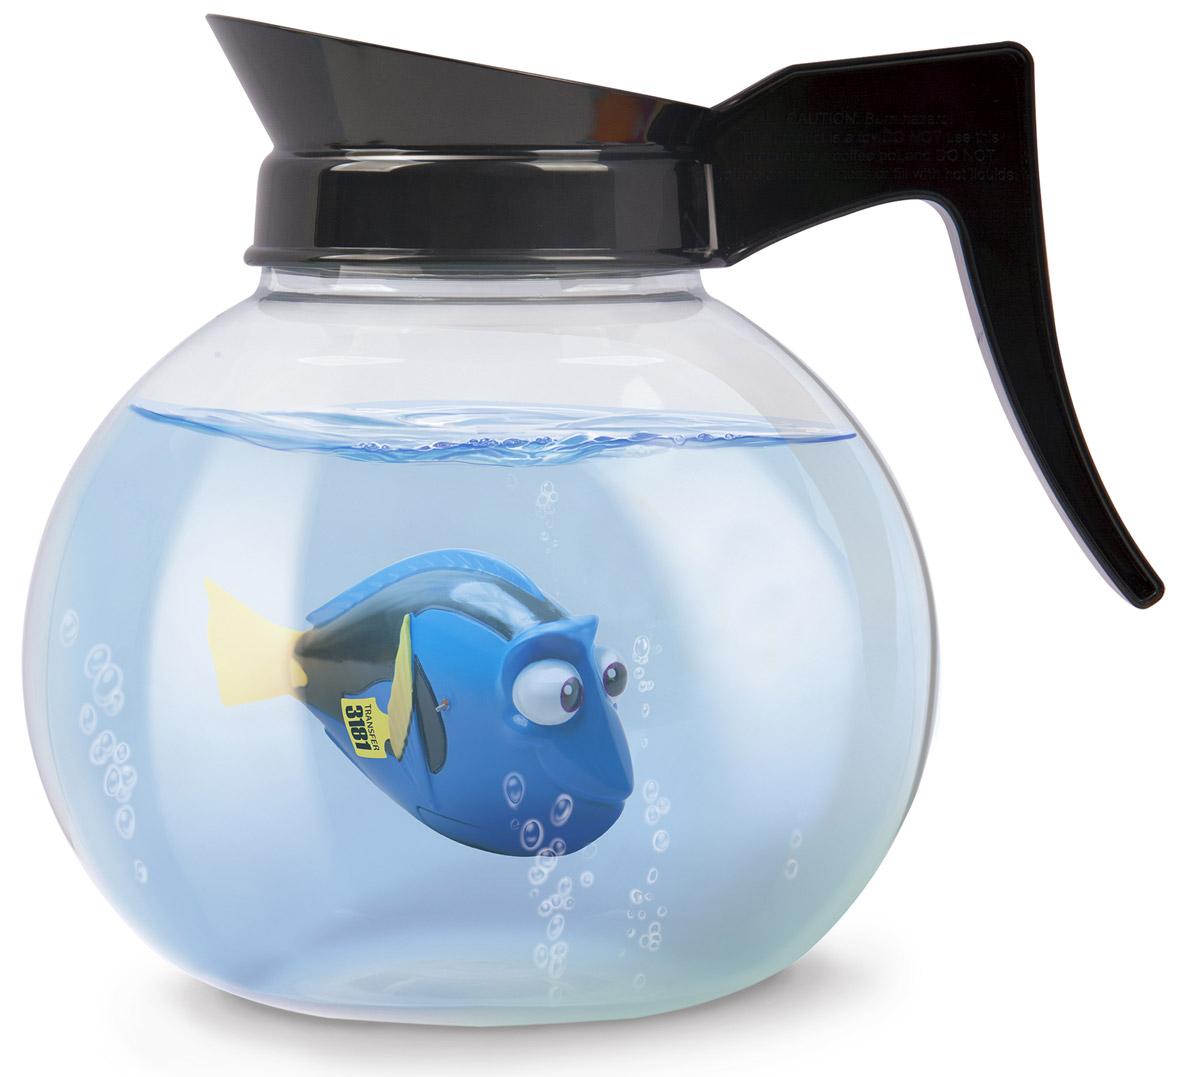 Dory Робот Рыбка Дори и аквариум-кофейник finding dory finding dory 36360 в поисках дори фигурка подводного обитателя 4 5 см в ассортименте